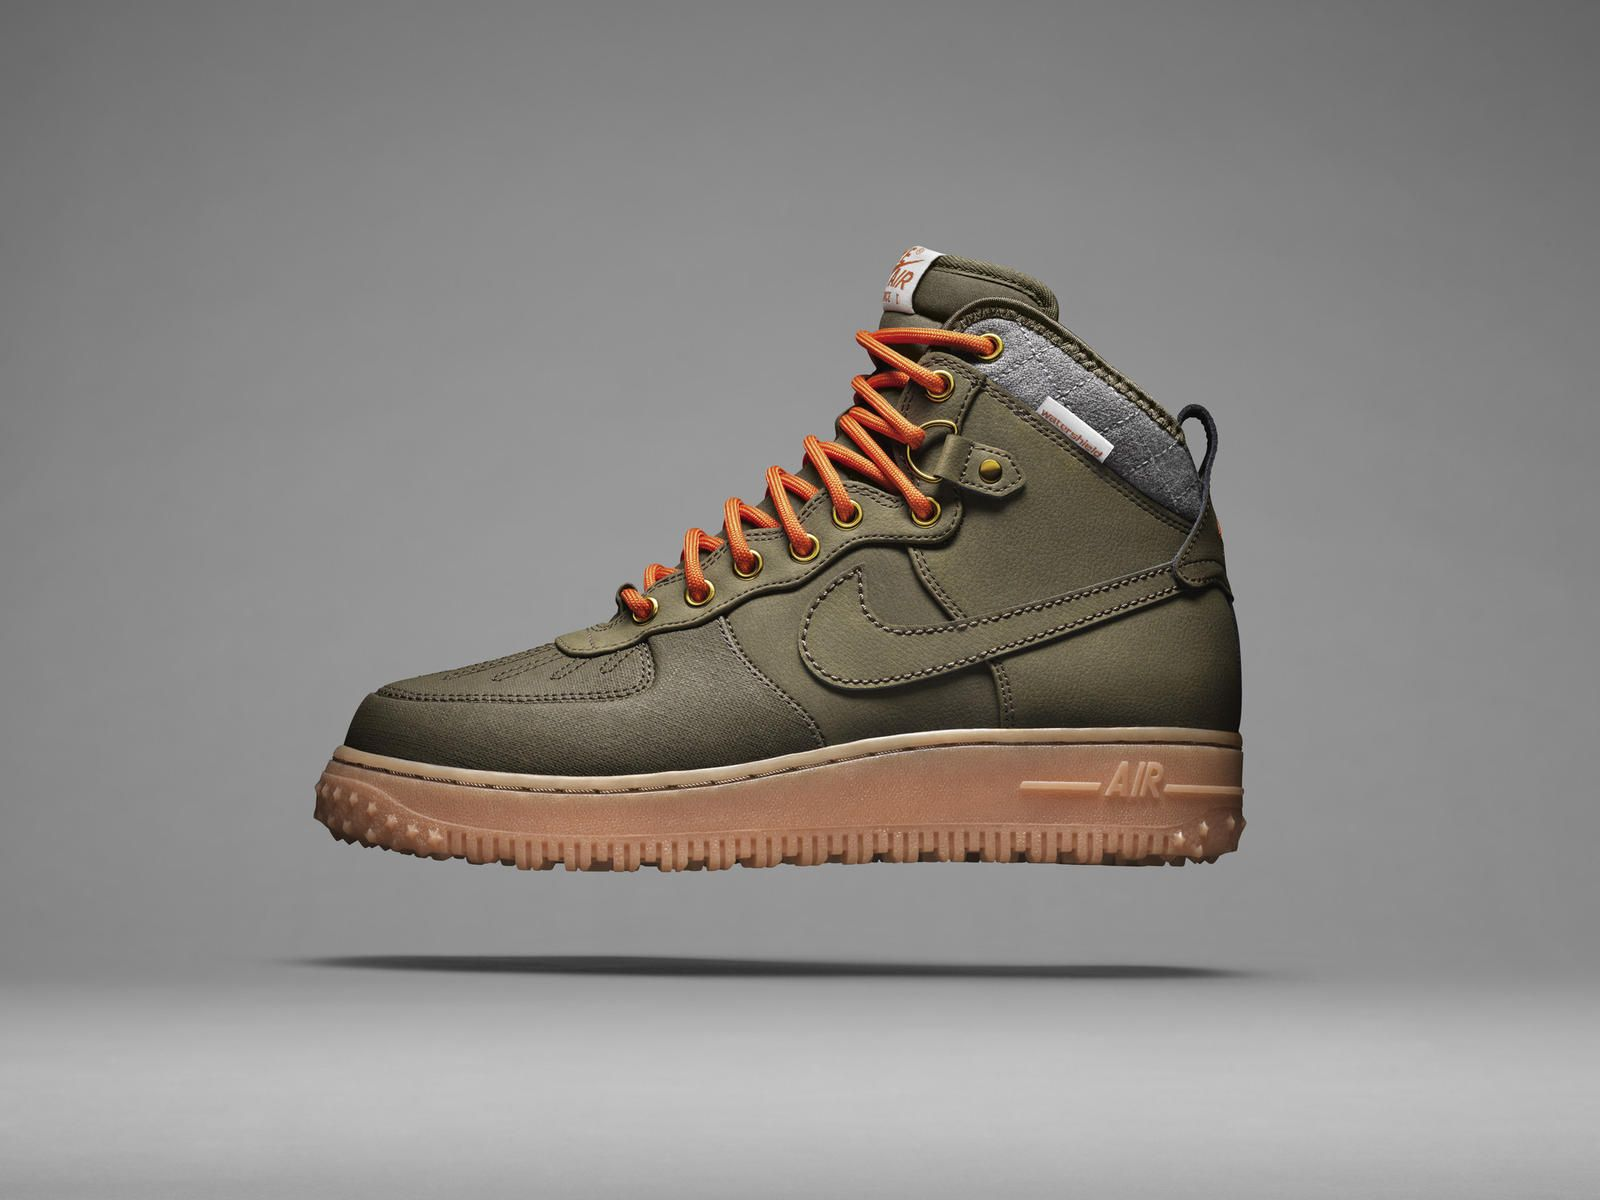 Nike Air Force 1 Bottes Femmes Couleur Rouille